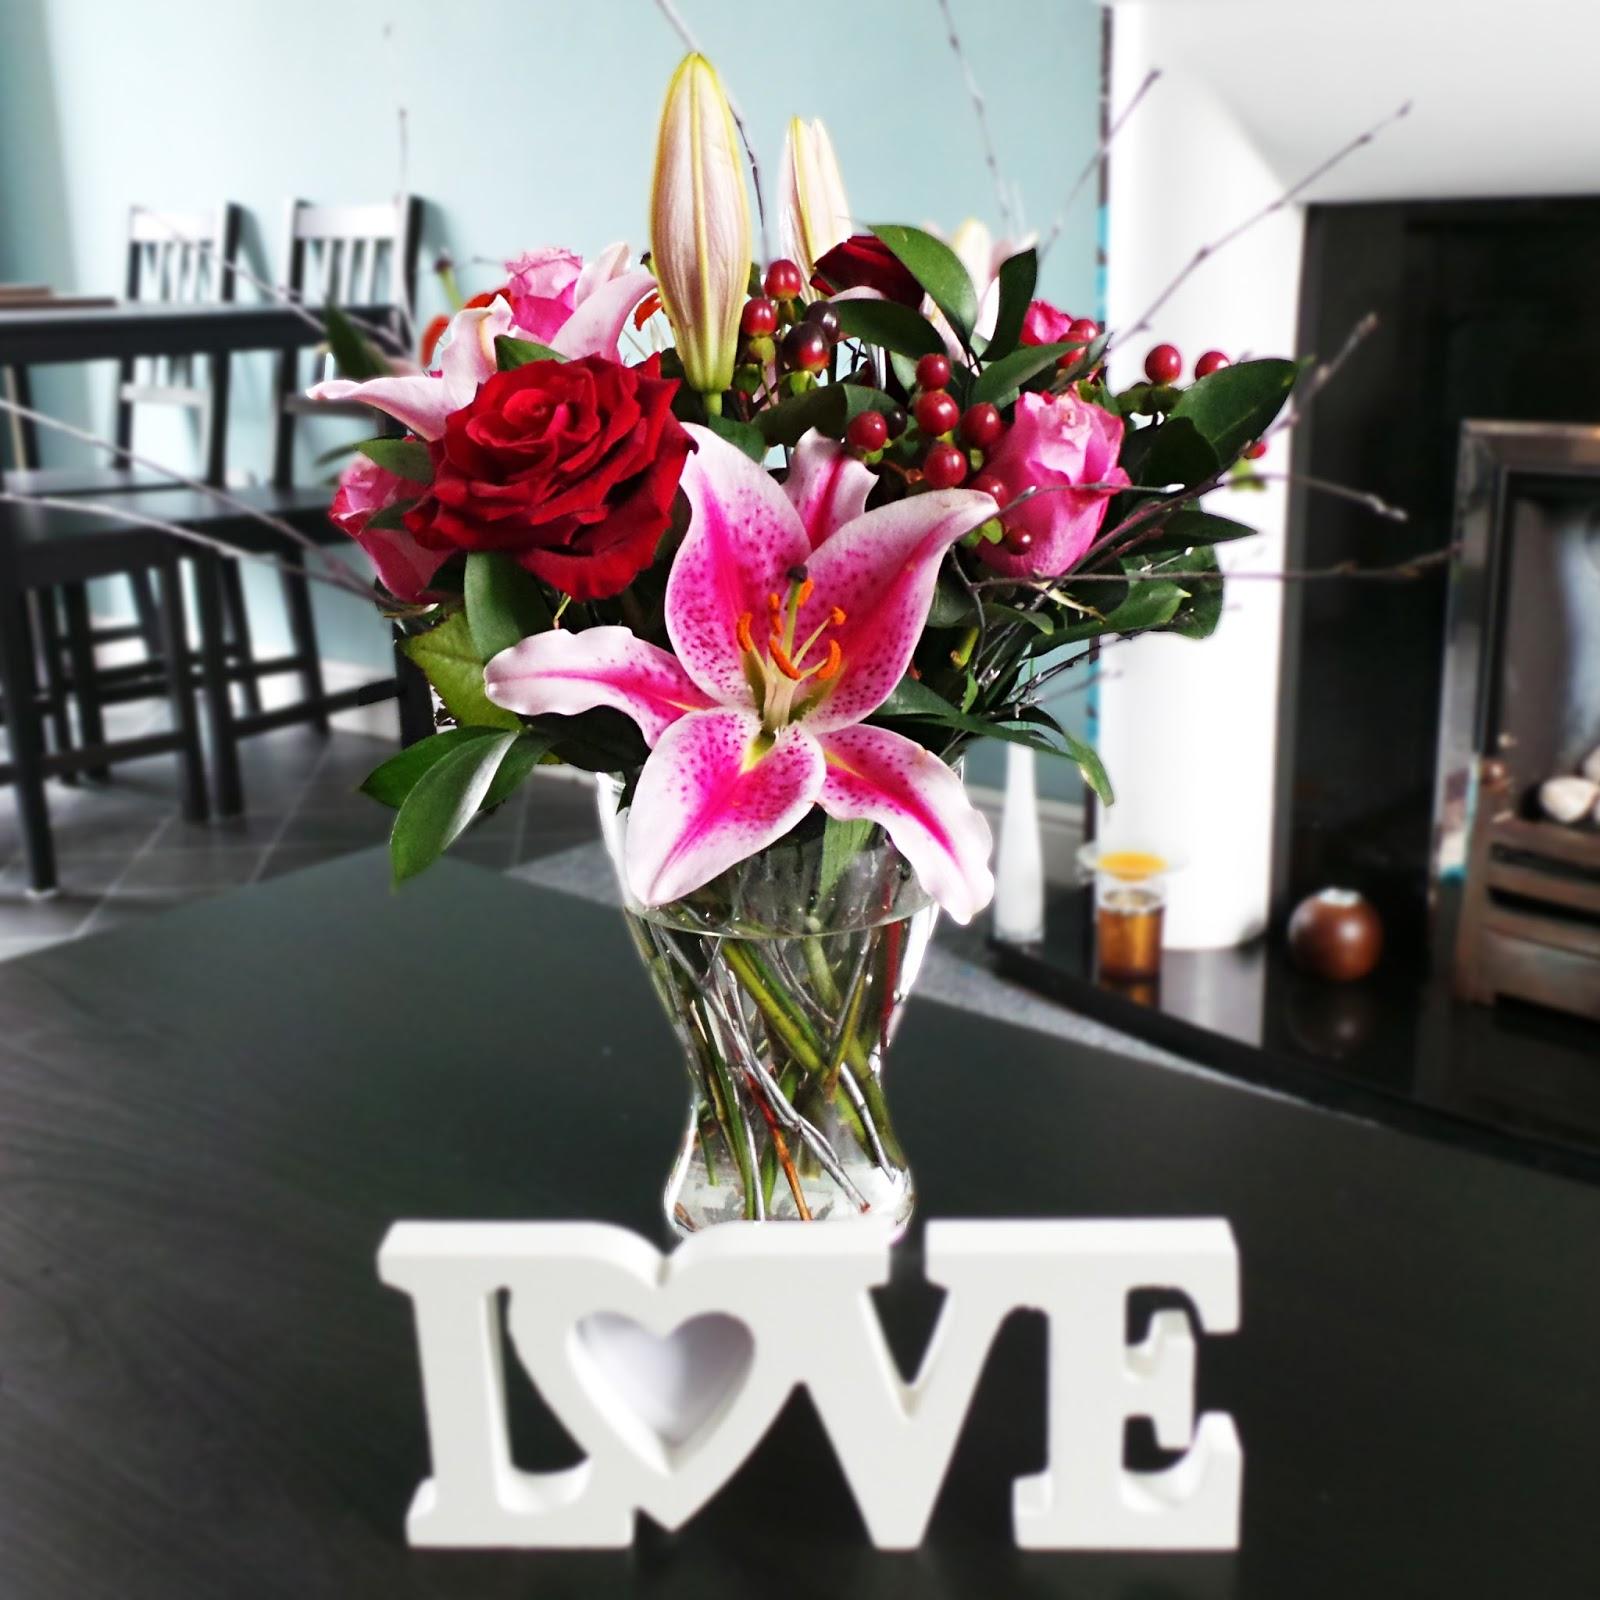 Lauras all made up uk beauty fashion lifestyle blog debenhams debenhams christmas flower bouquet review 40 off discount code debenhams flowers review izmirmasajfo